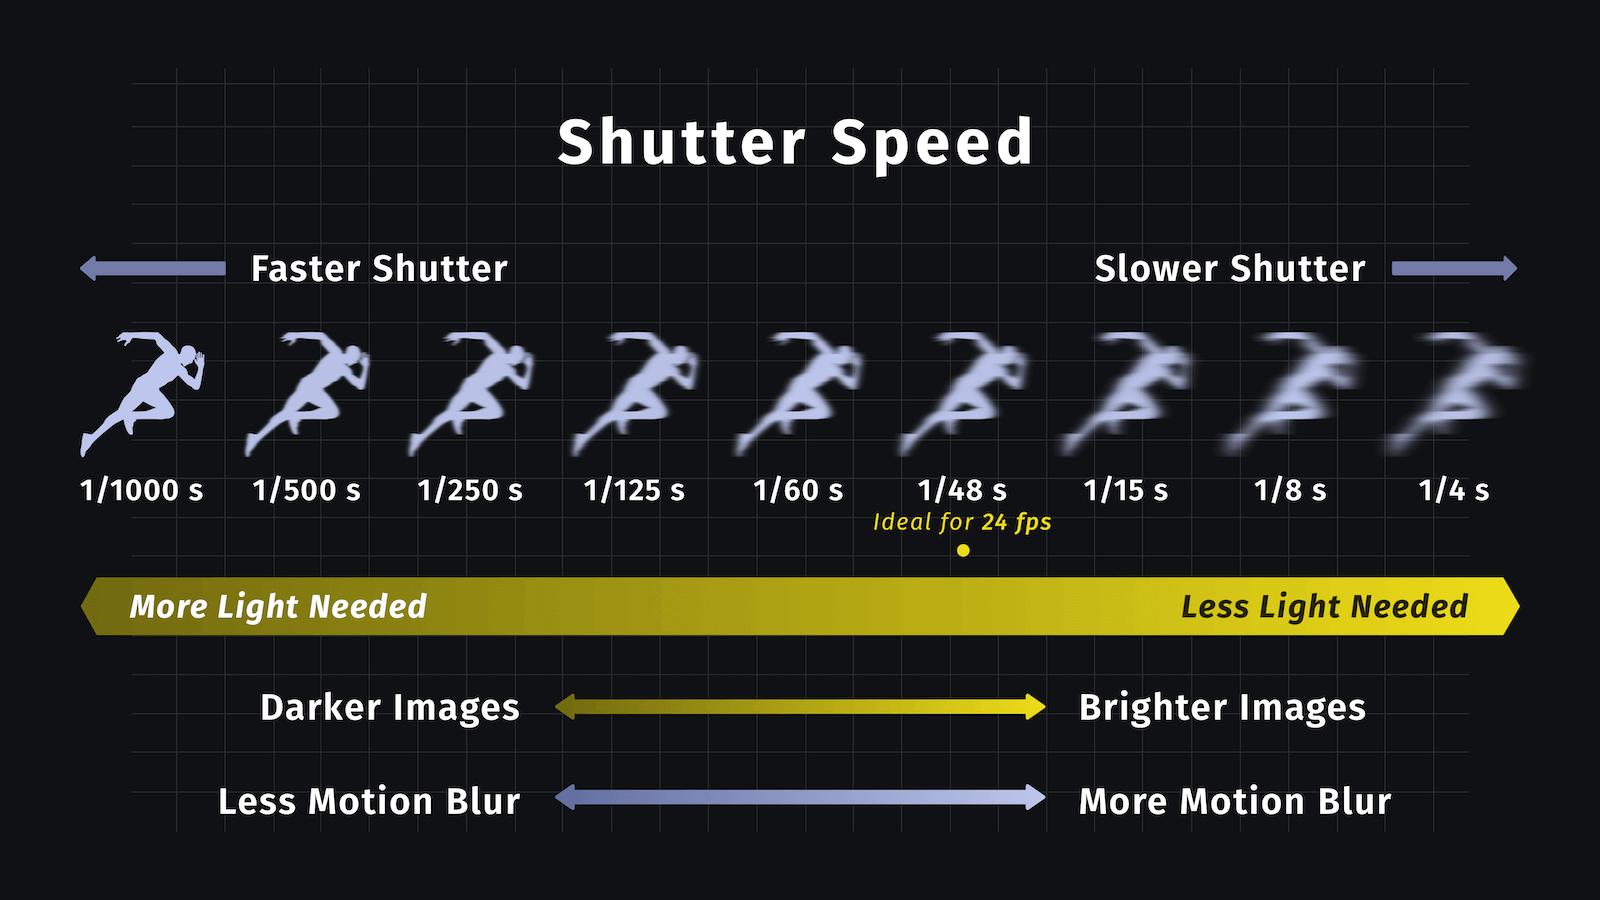 Ultimate Guide to Shutter Speed - Shutter Speeds